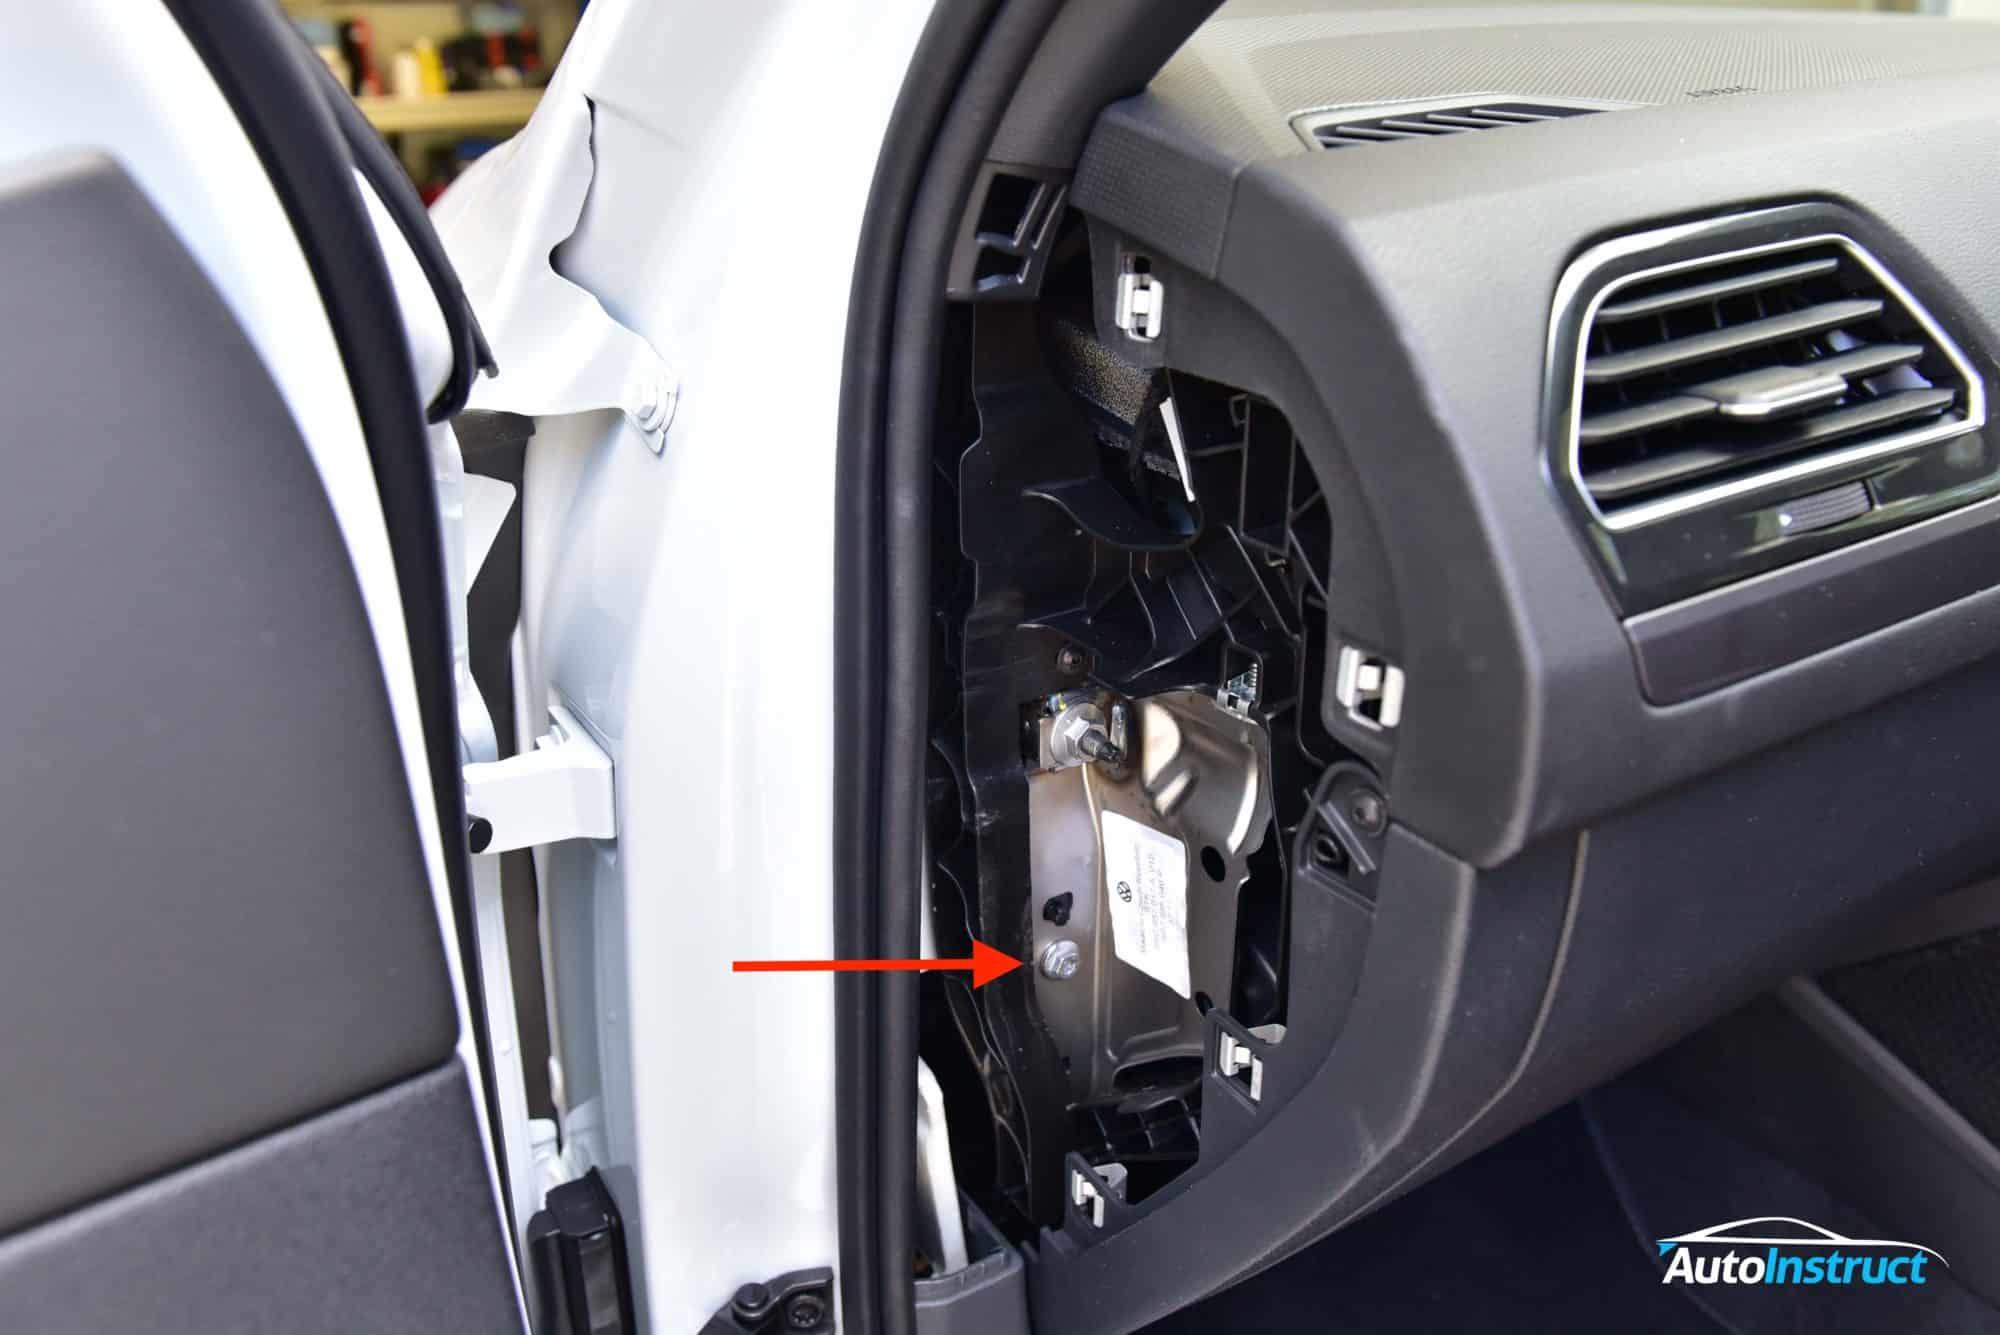 Dash Cam Install Tutorial Volkswagen Mk2 Tiguan Autoinstruct Fuse Box Step 12